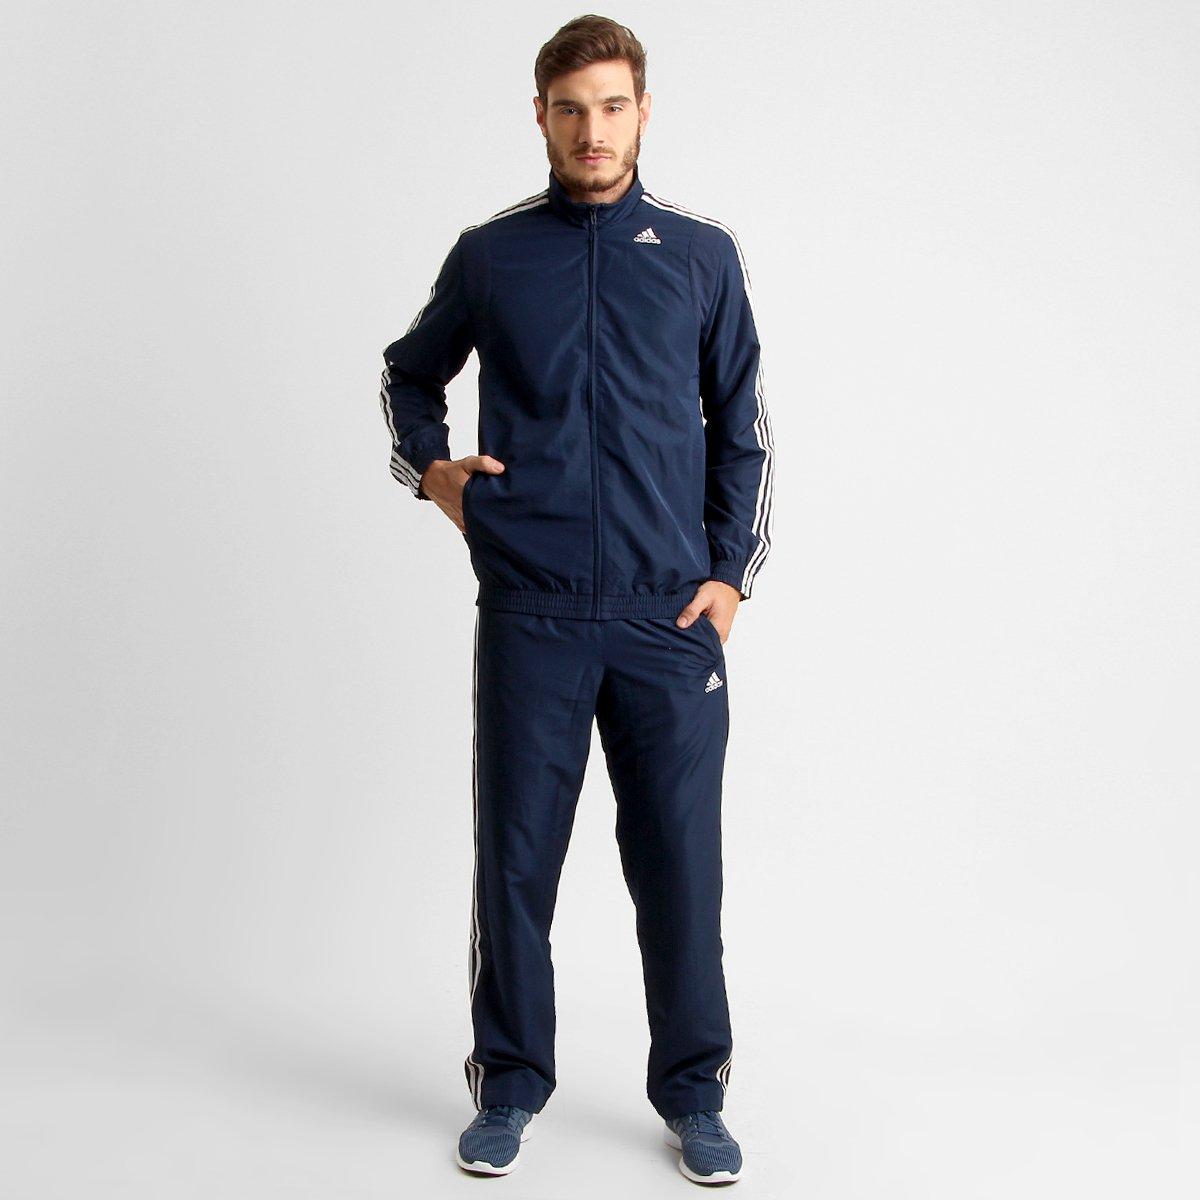 7b3cf41c89 Agasalho Adidas Woven Basic 3S - Compre Agora